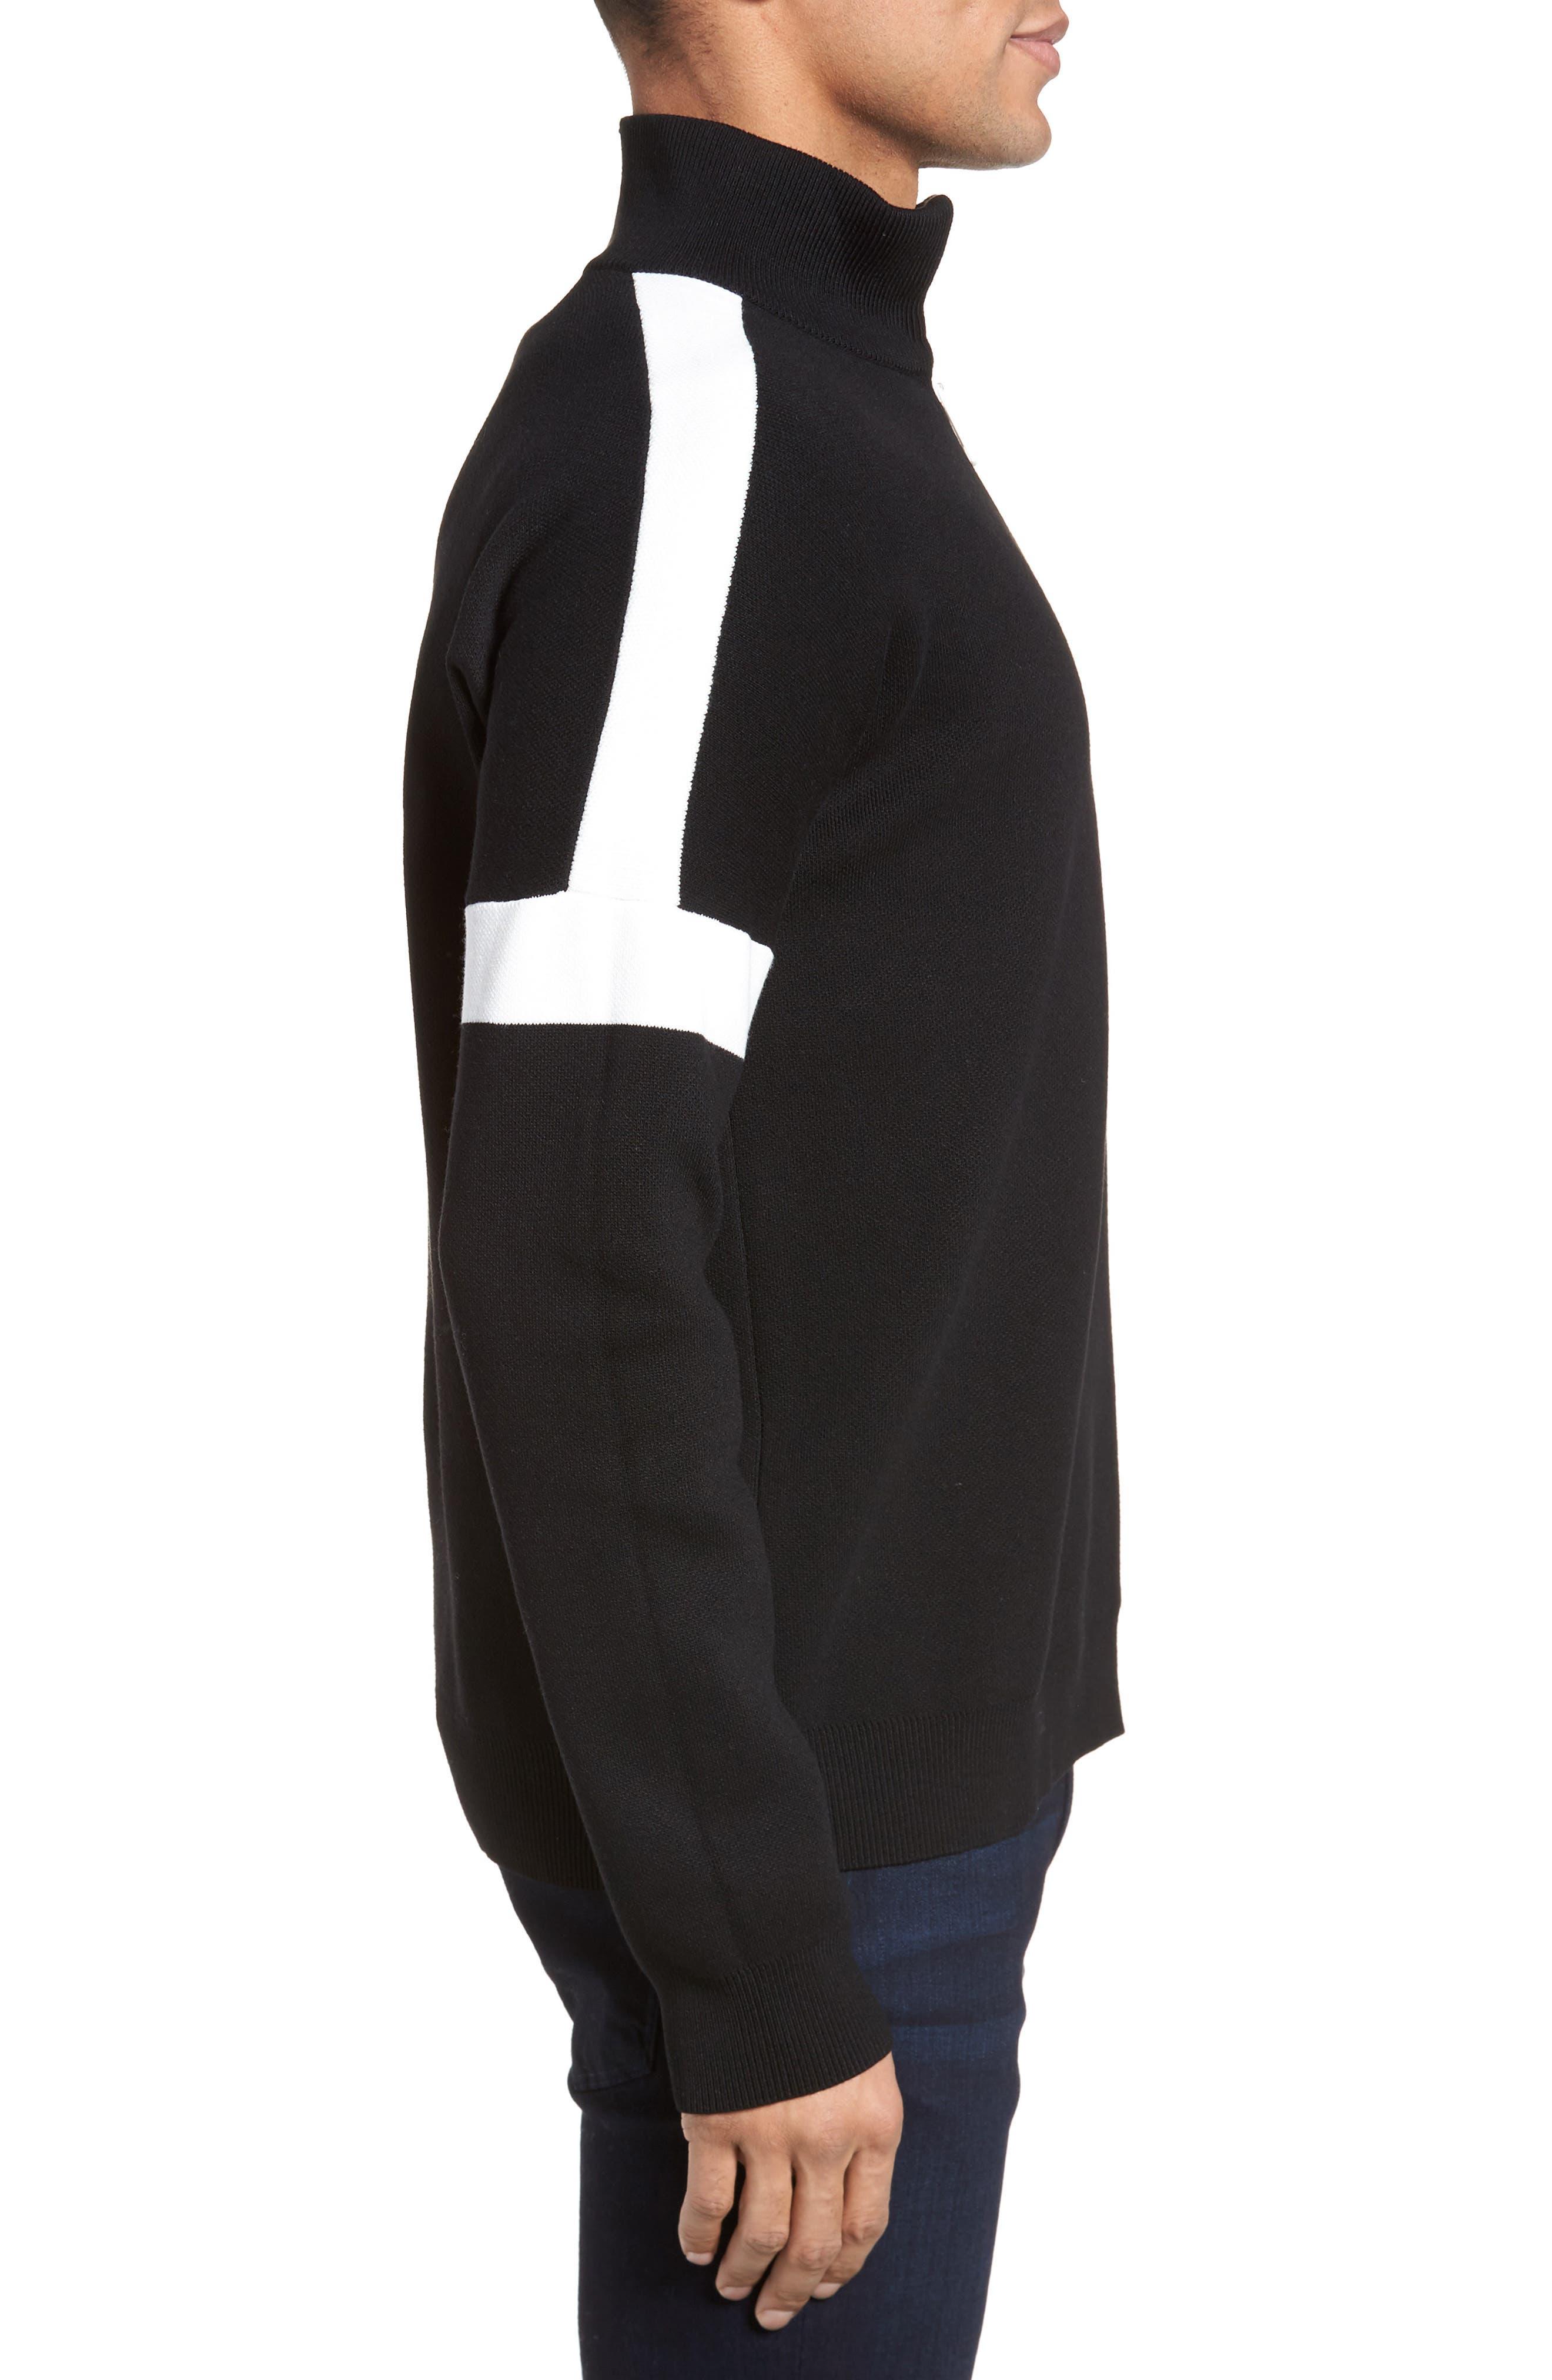 Lakra Regular Fit Half Zip Pullover,                             Alternate thumbnail 3, color,                             Black/Milk/Black